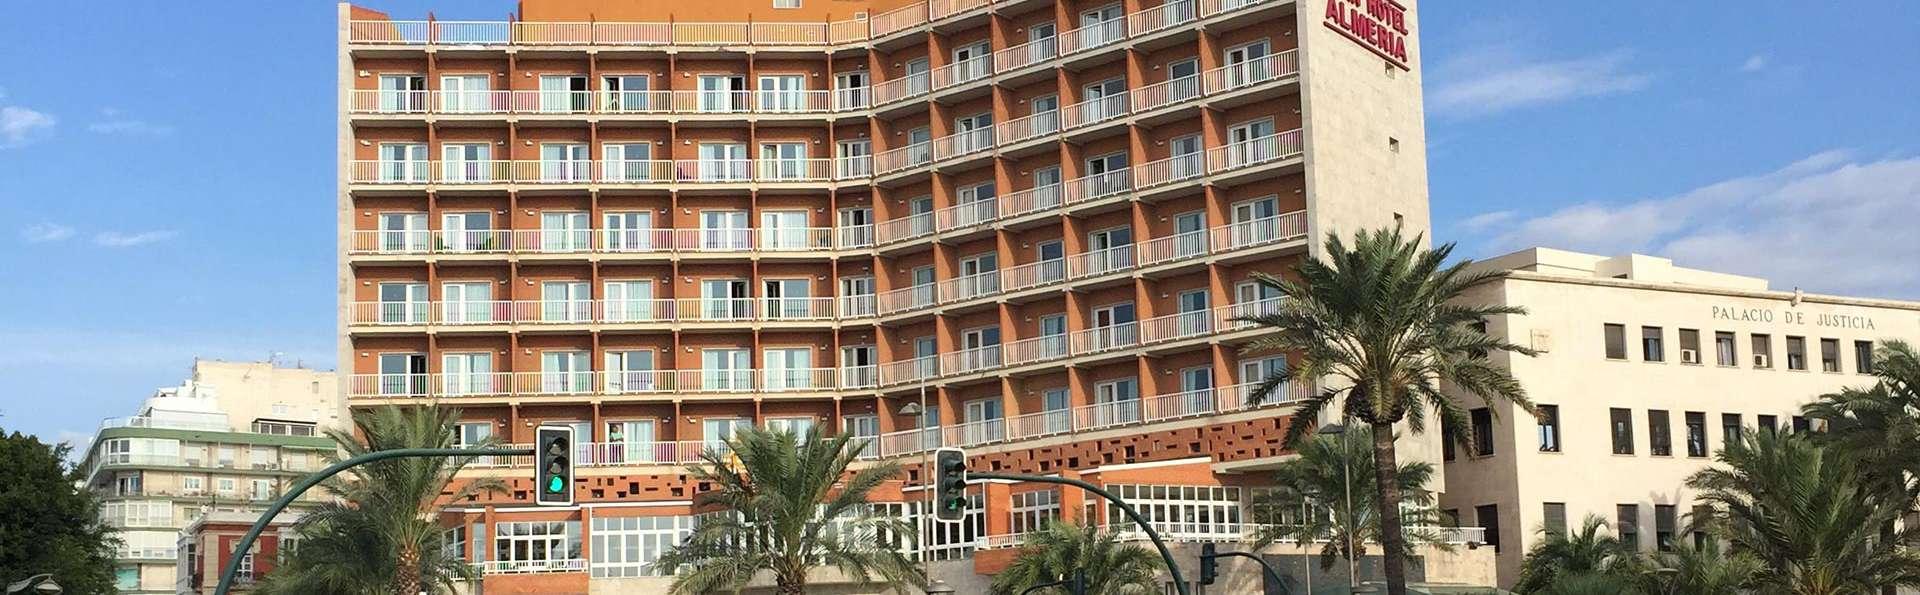 Ohtels Gran Hotel Almería - EDIT_N3_FRONT_01.jpg